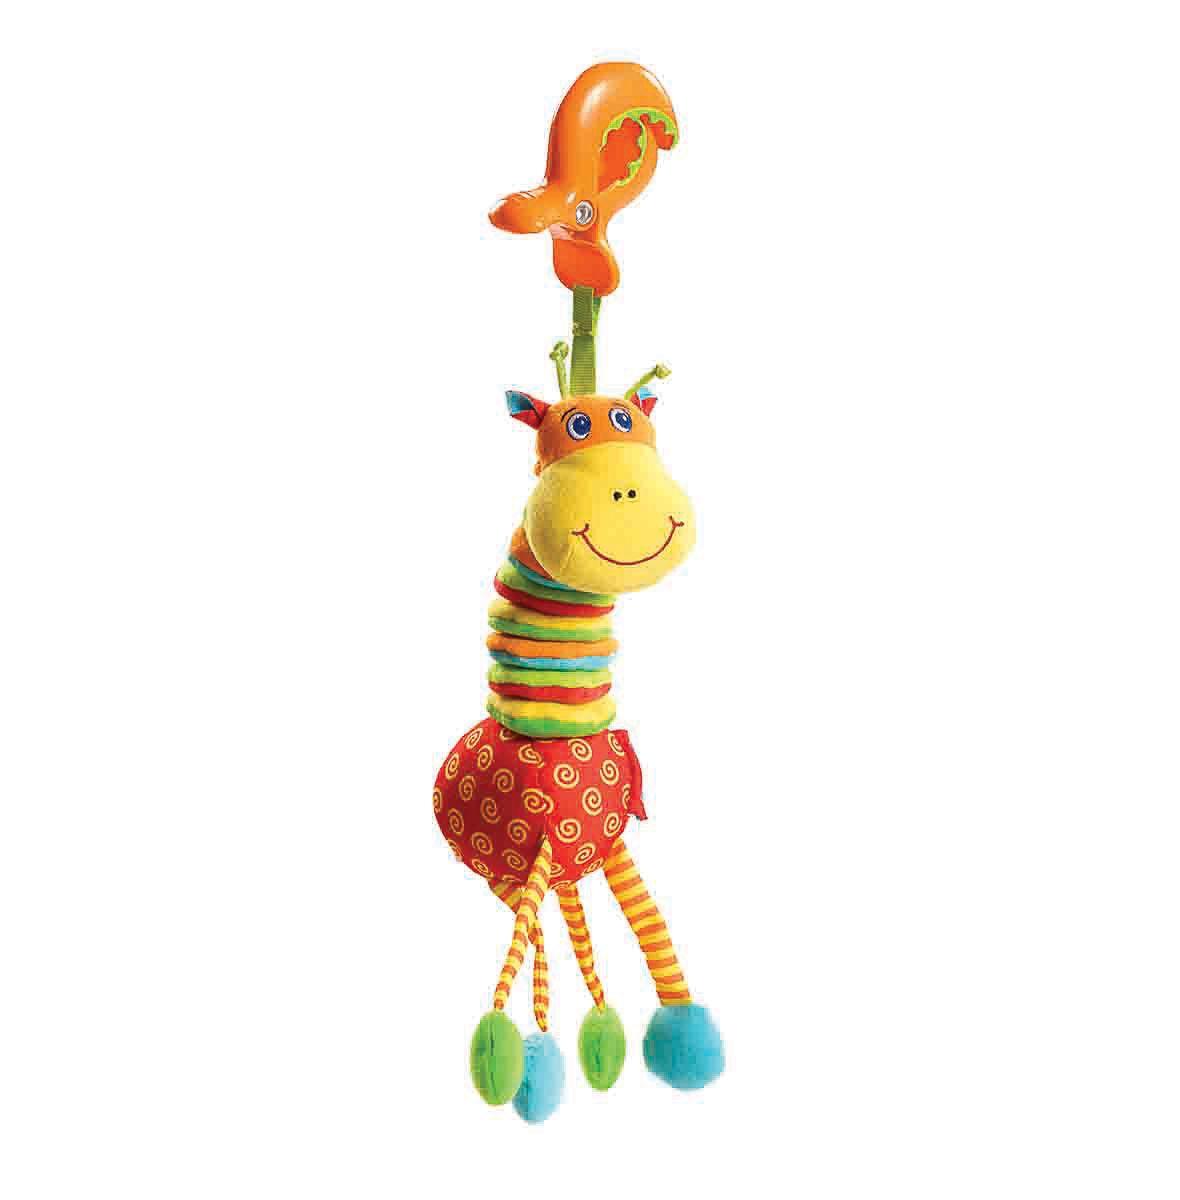 Móbile Portátil Tiny Smart Jittering Giraffe - Tiny Love